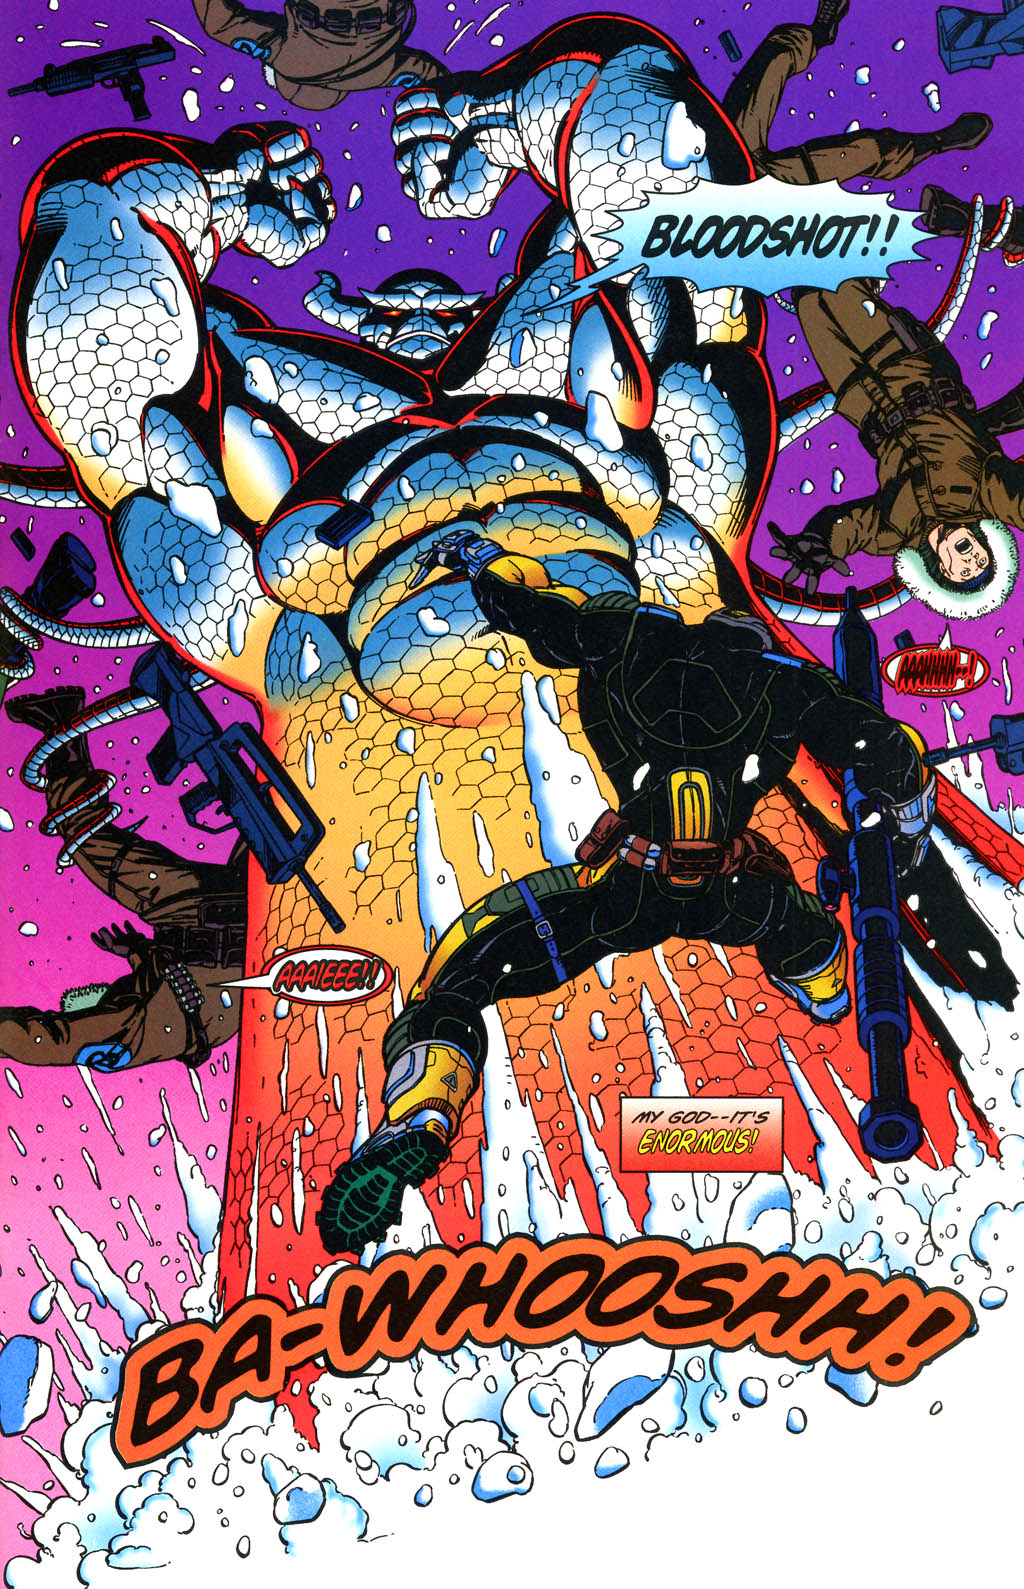 Read online Bloodshot (1993) comic -  Issue #50 - 17